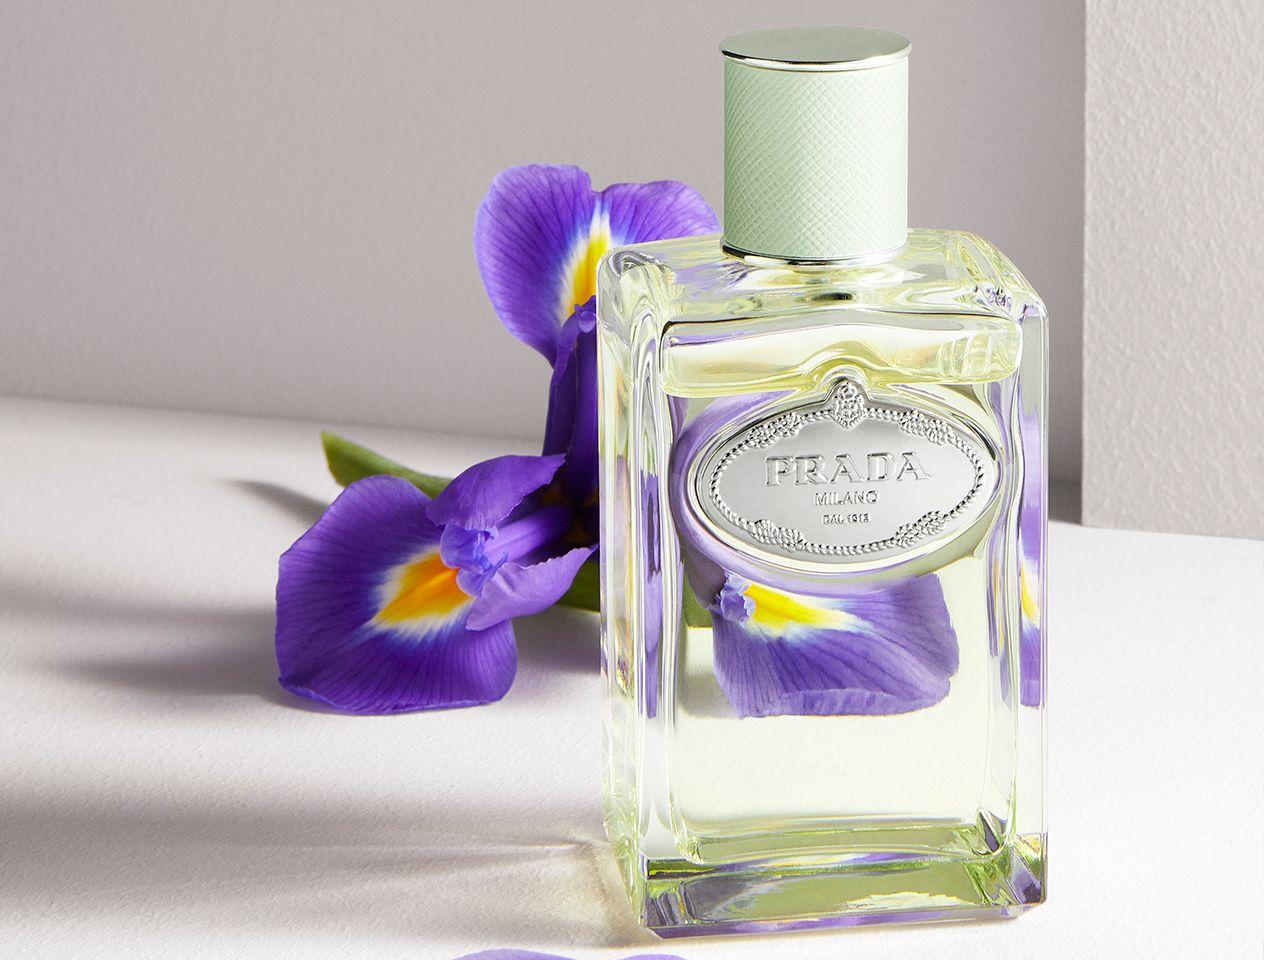 How to find your signature scent: Prada